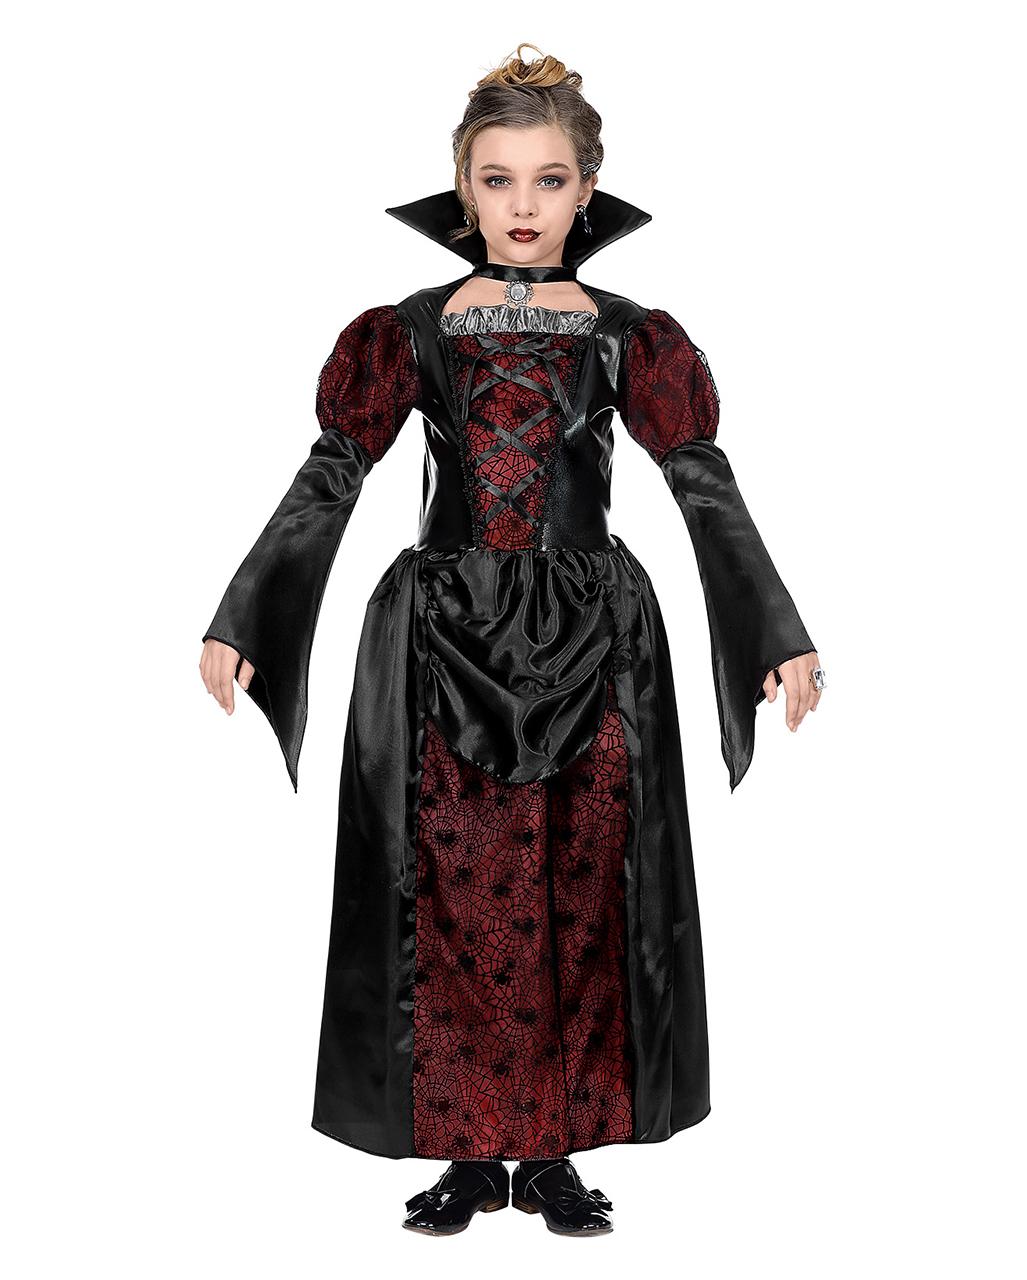 Transylvanian Vampiress Vampire Gothic Black Dress Up Halloween Child Costume